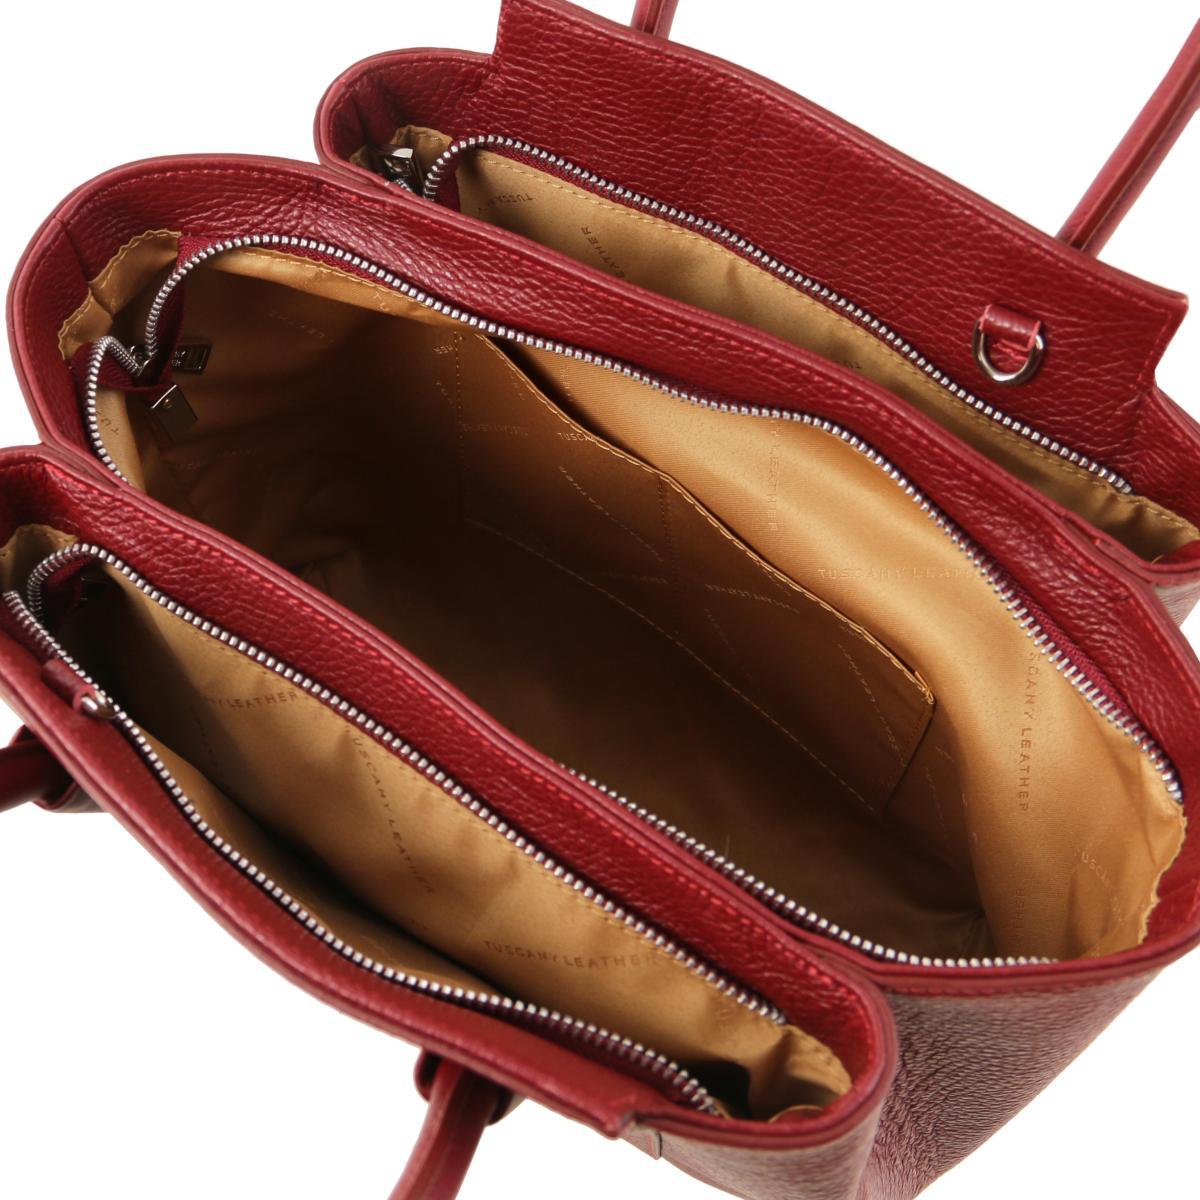 af9bf5f767 Sac à Main Cuir Souple Femme Rouge - Tuscany Leather -